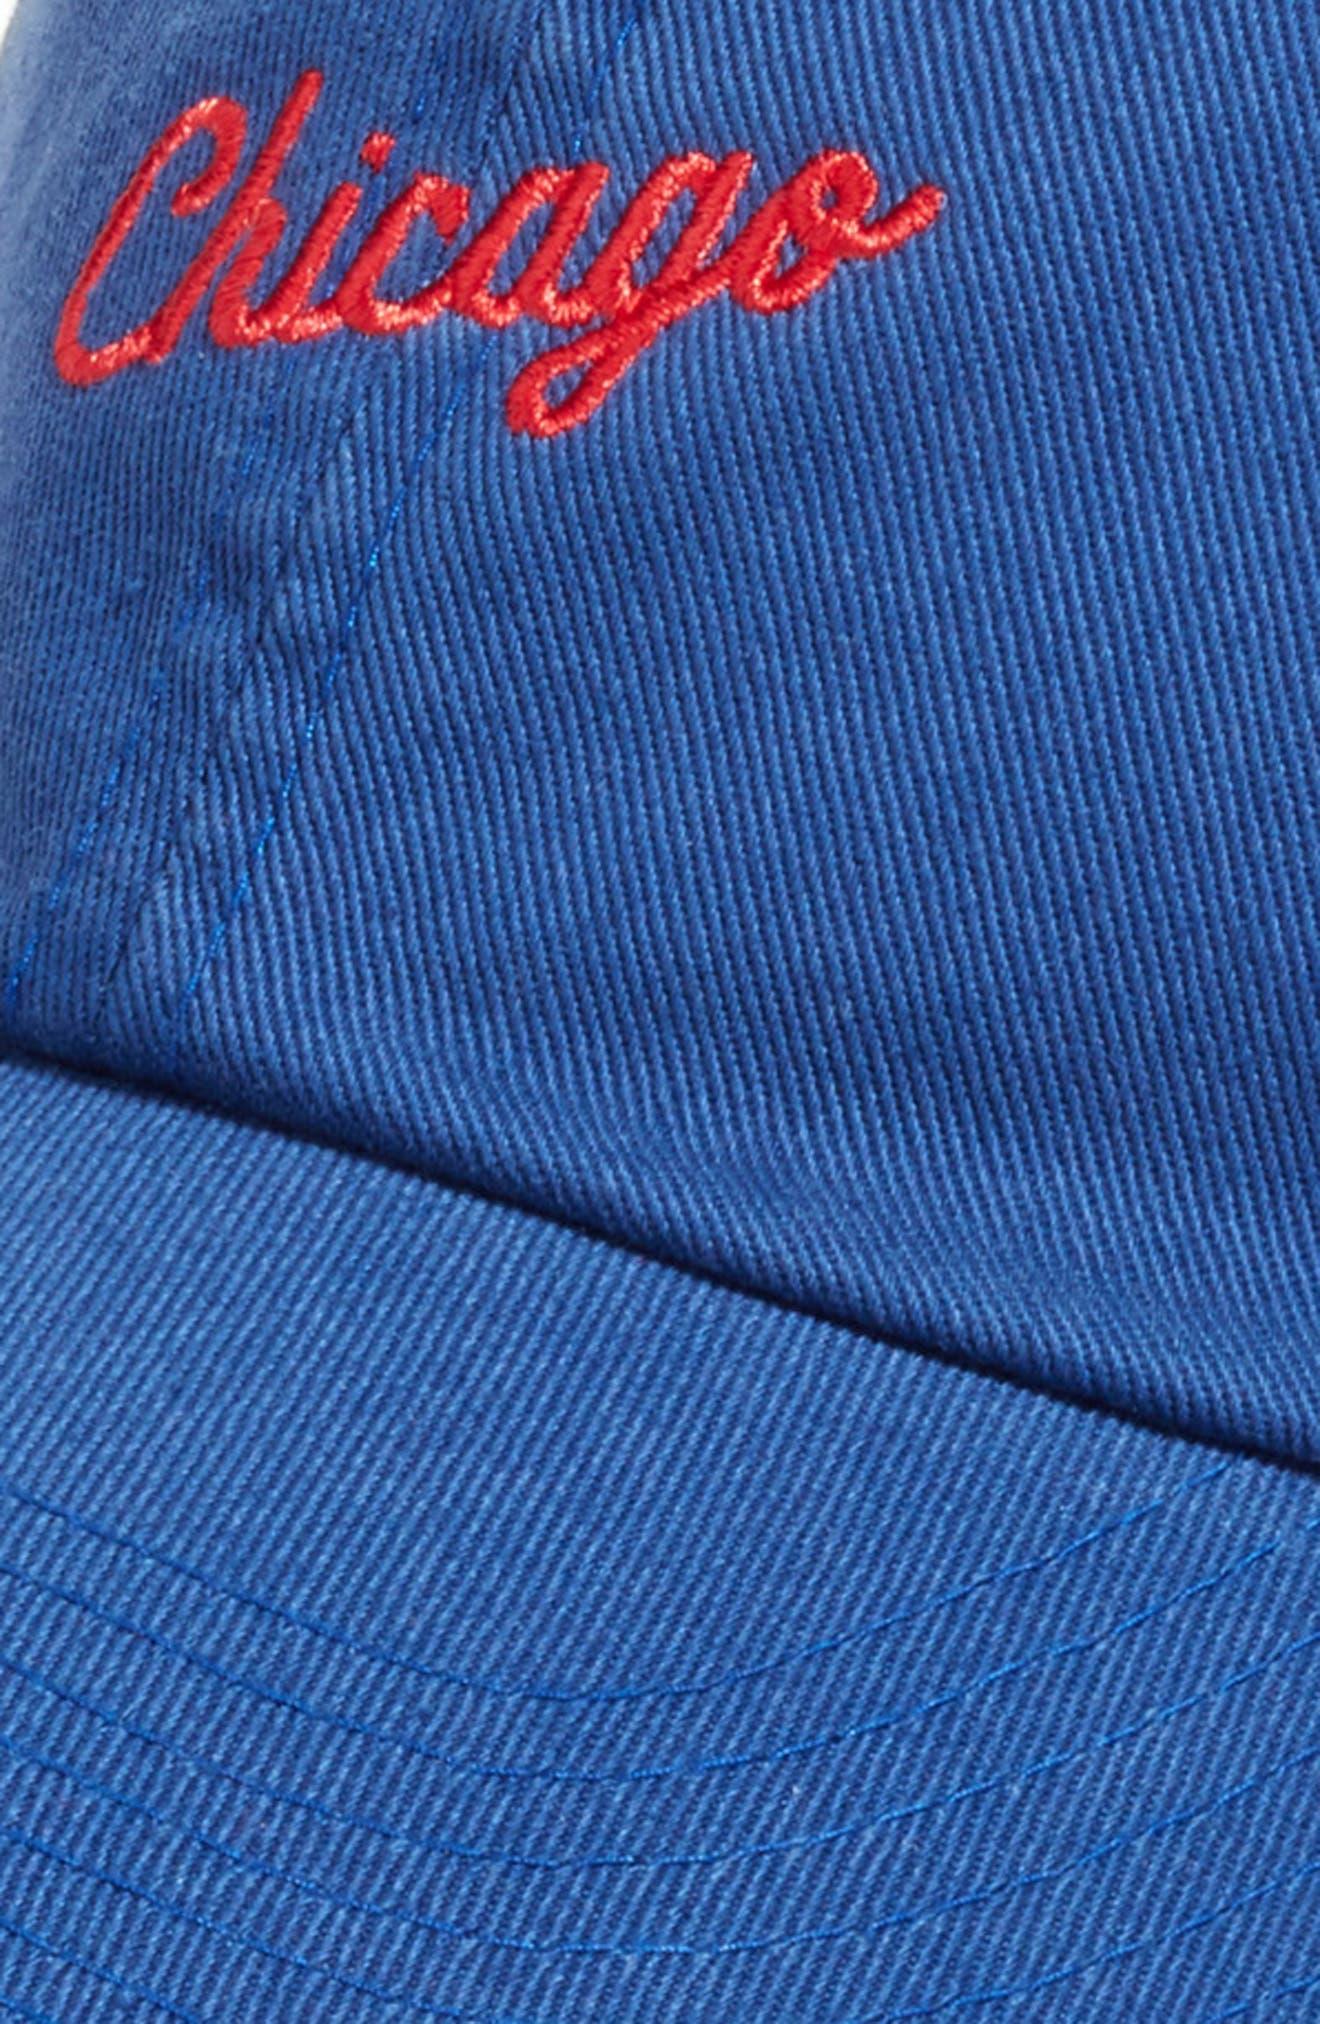 Boardshort - Chicago Baseball Cap,                             Alternate thumbnail 3, color,                             BAY BLUE